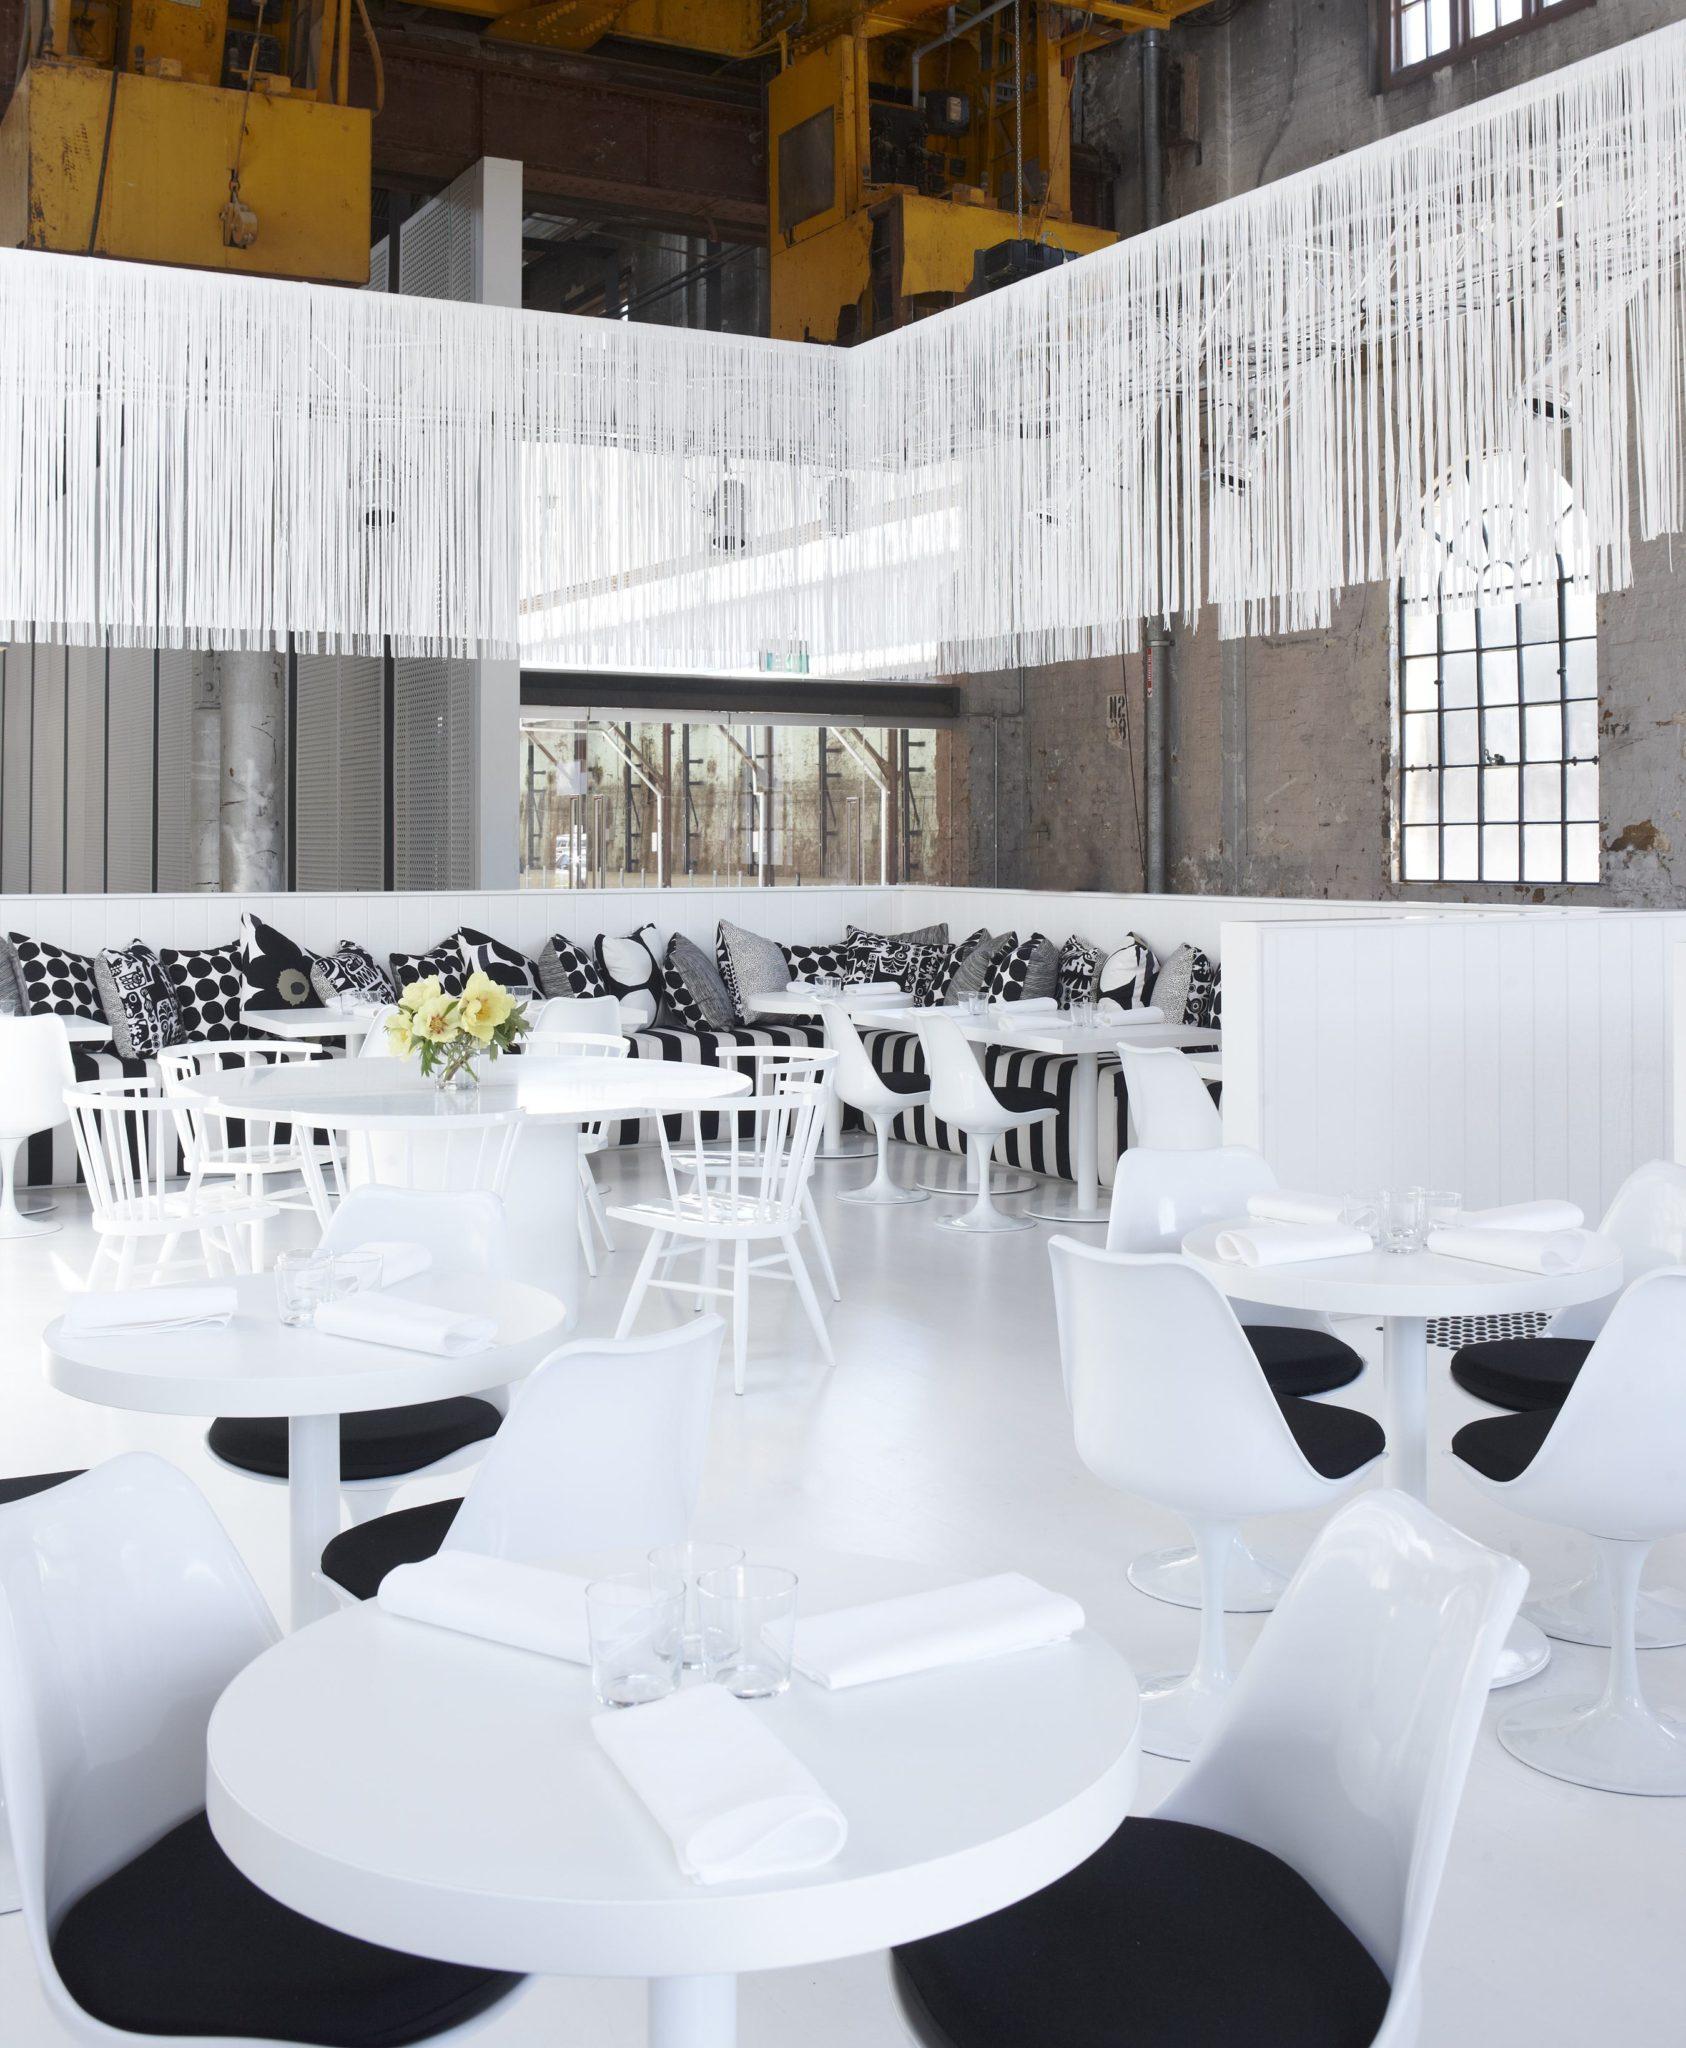 Belle coco republic interior design award finalists for Interior design email